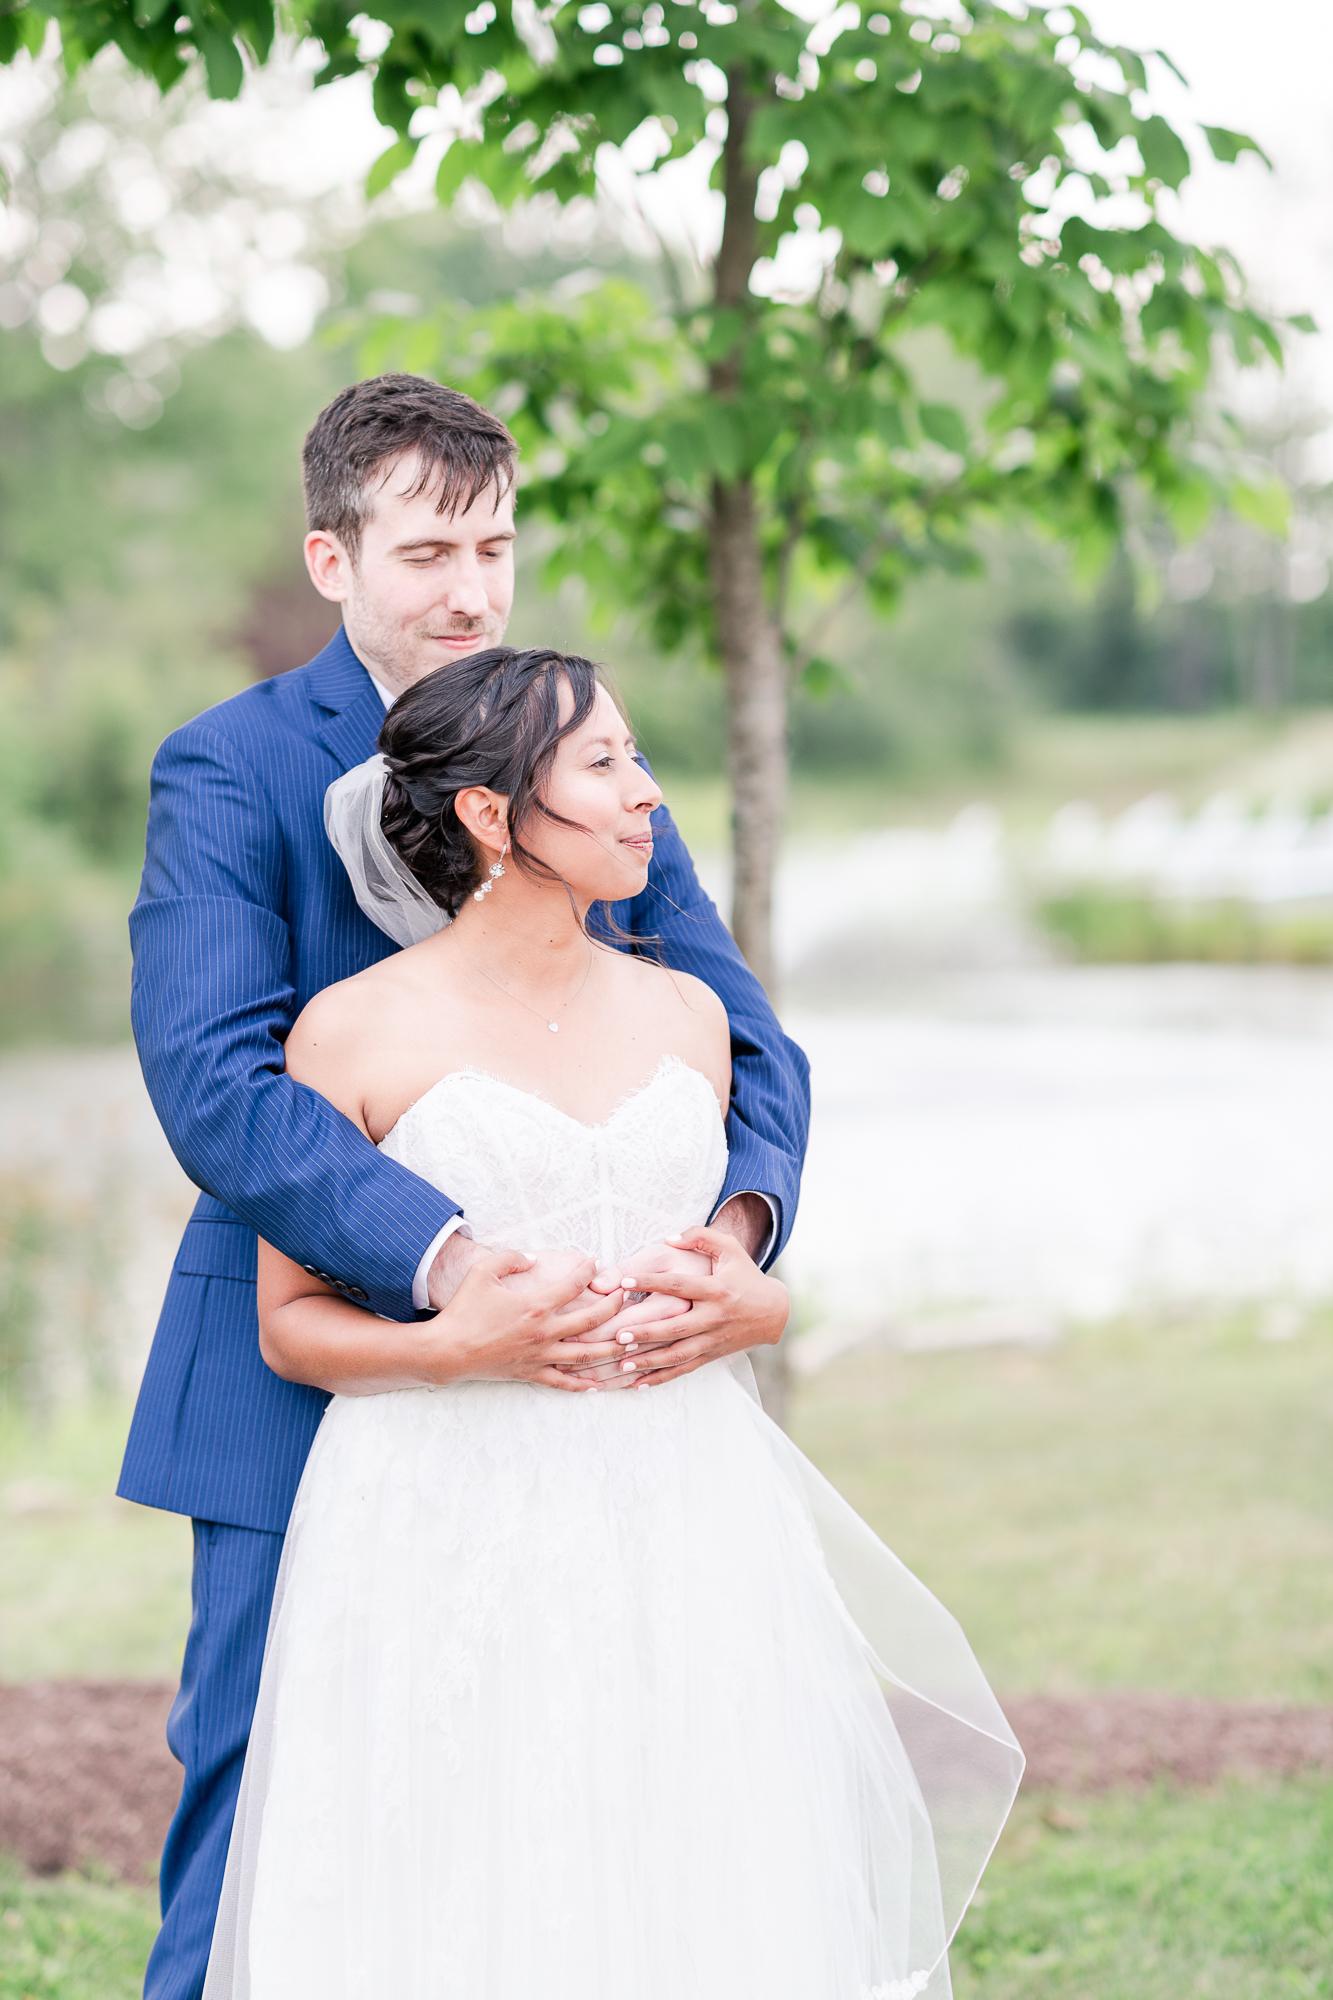 Maria+Adam_Summer Barn Wedding_The Barn and The North Star Preserve_Oberlin_Ohio-118.jpg